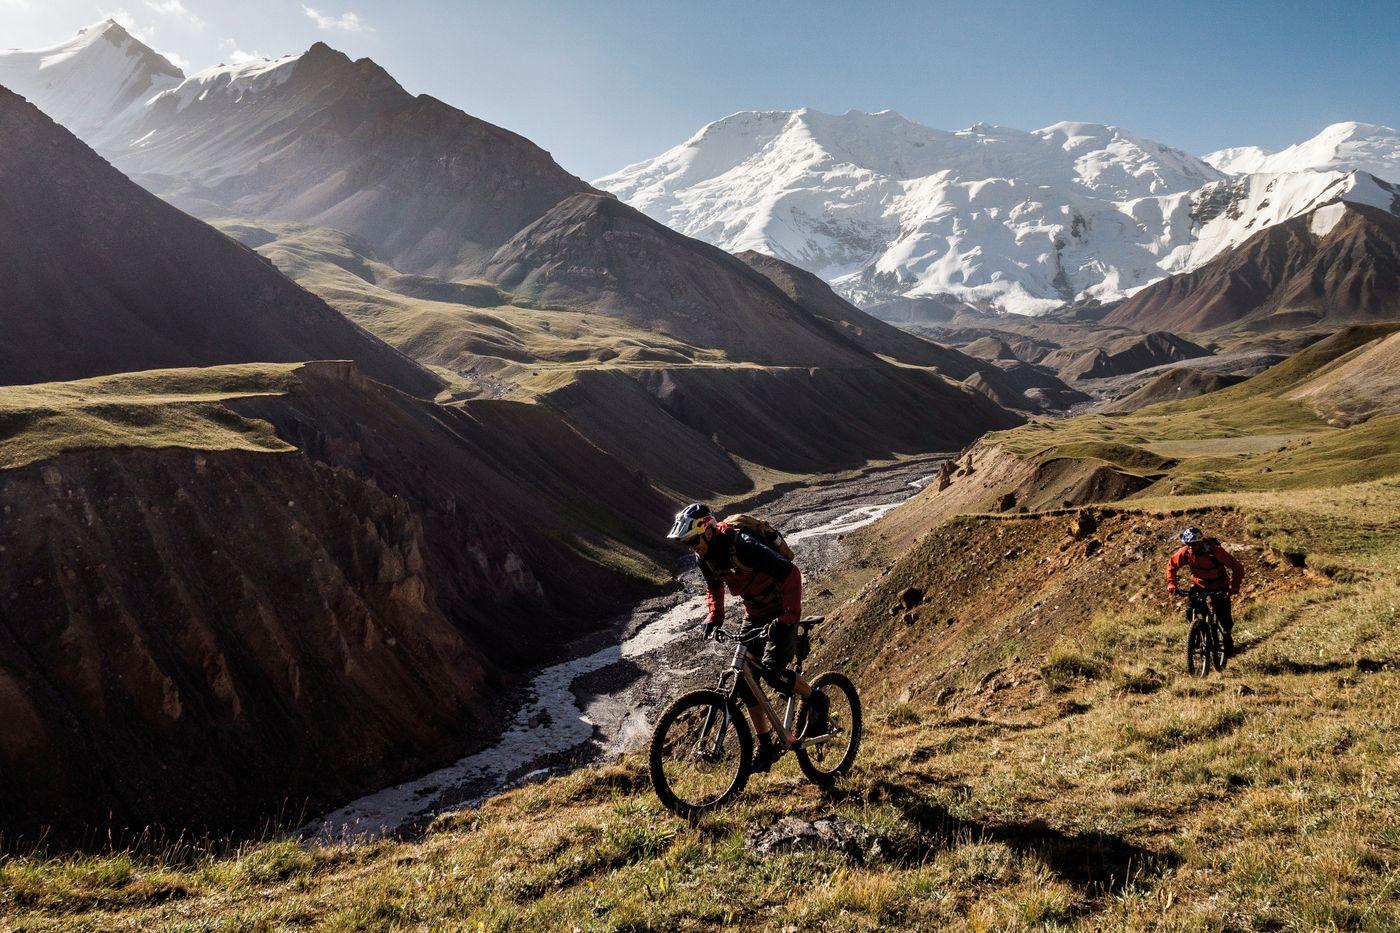 Durchs Wilde Kirgistan - Gipfel des Pik Lenin